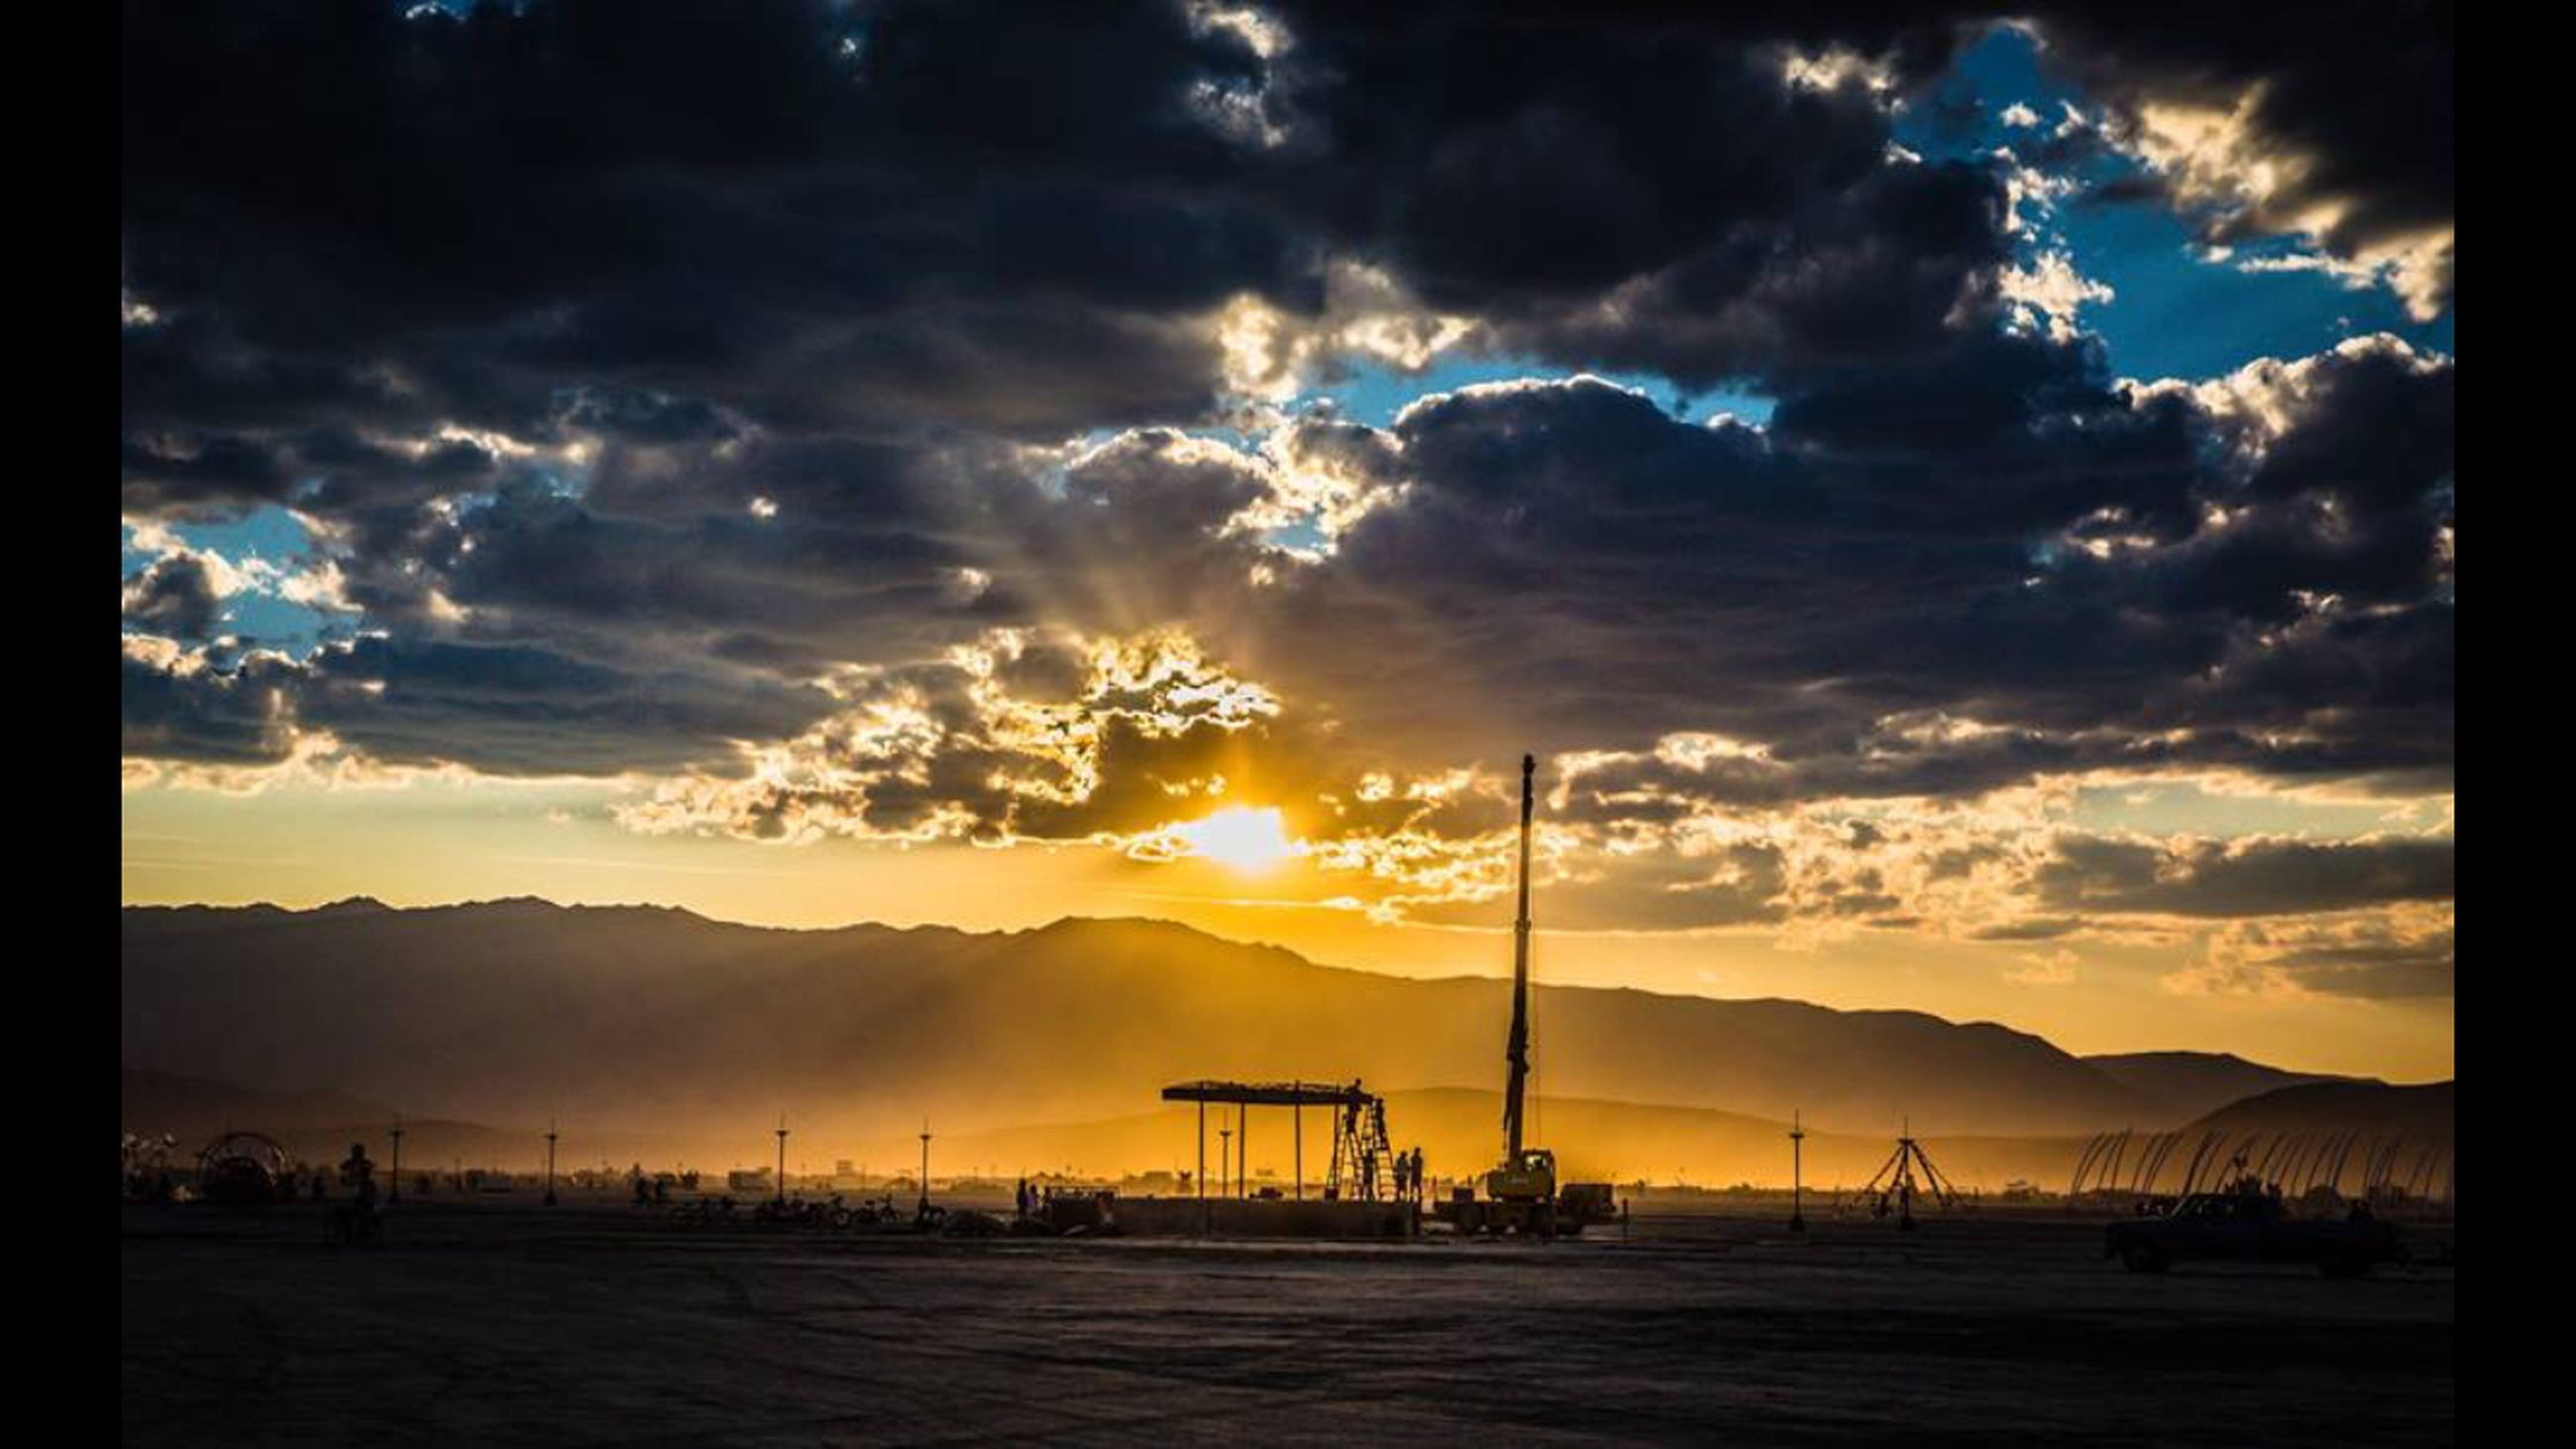 sunset, sky, mountain, scenics, sun, tranquil scene, beauty in nature, tranquility, cloud - sky, mountain range, silhouette, nature, idyllic, sunlight, cloud, landscape, orange color, sunbeam, dramatic sky, cloudy